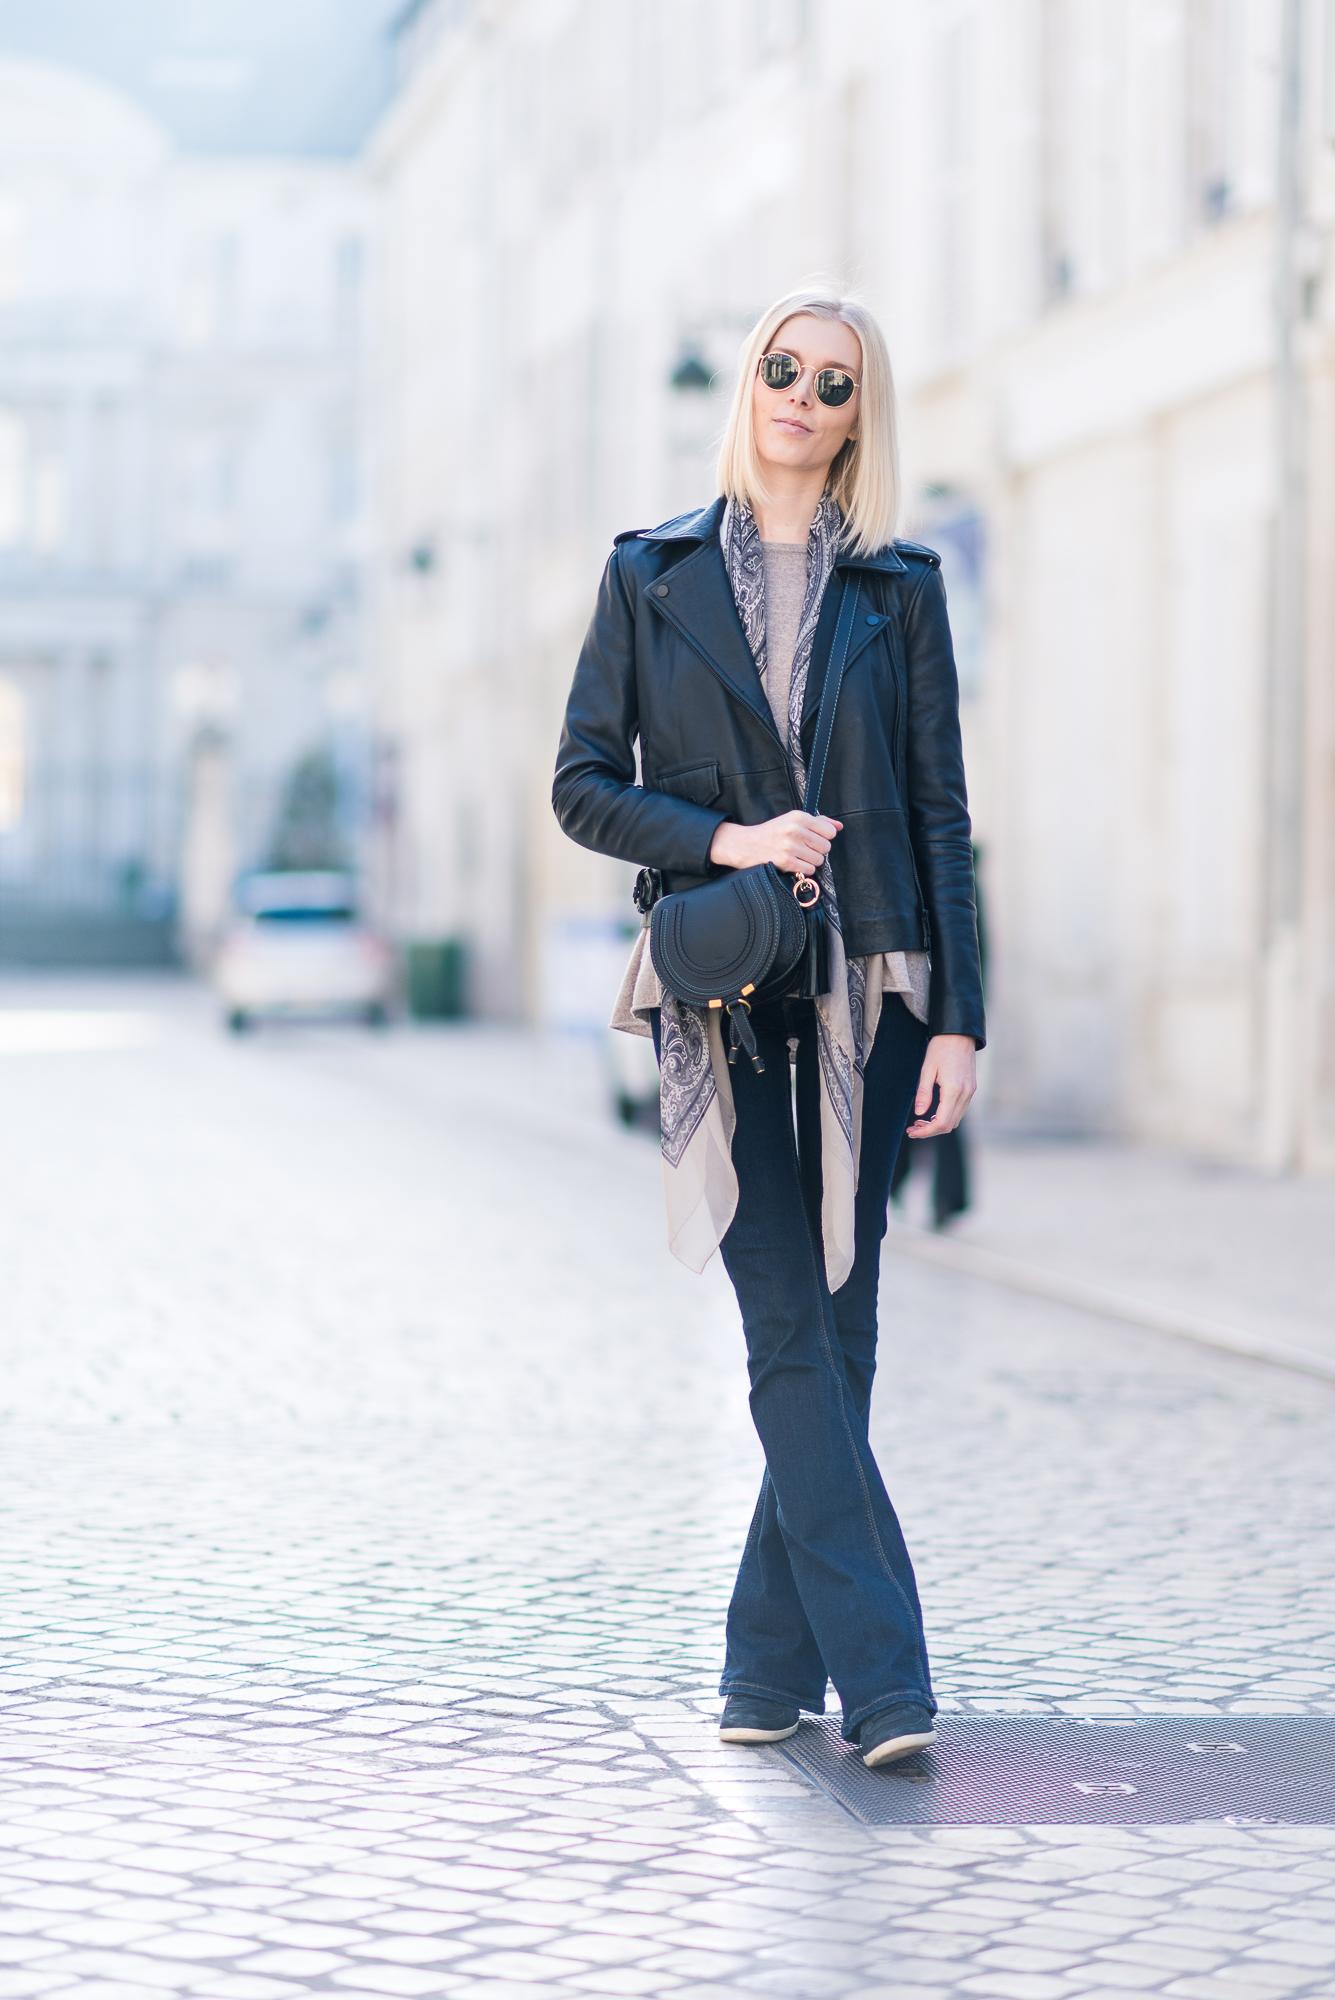 balmuir-scarf-anna-sofia-style-plaza-2